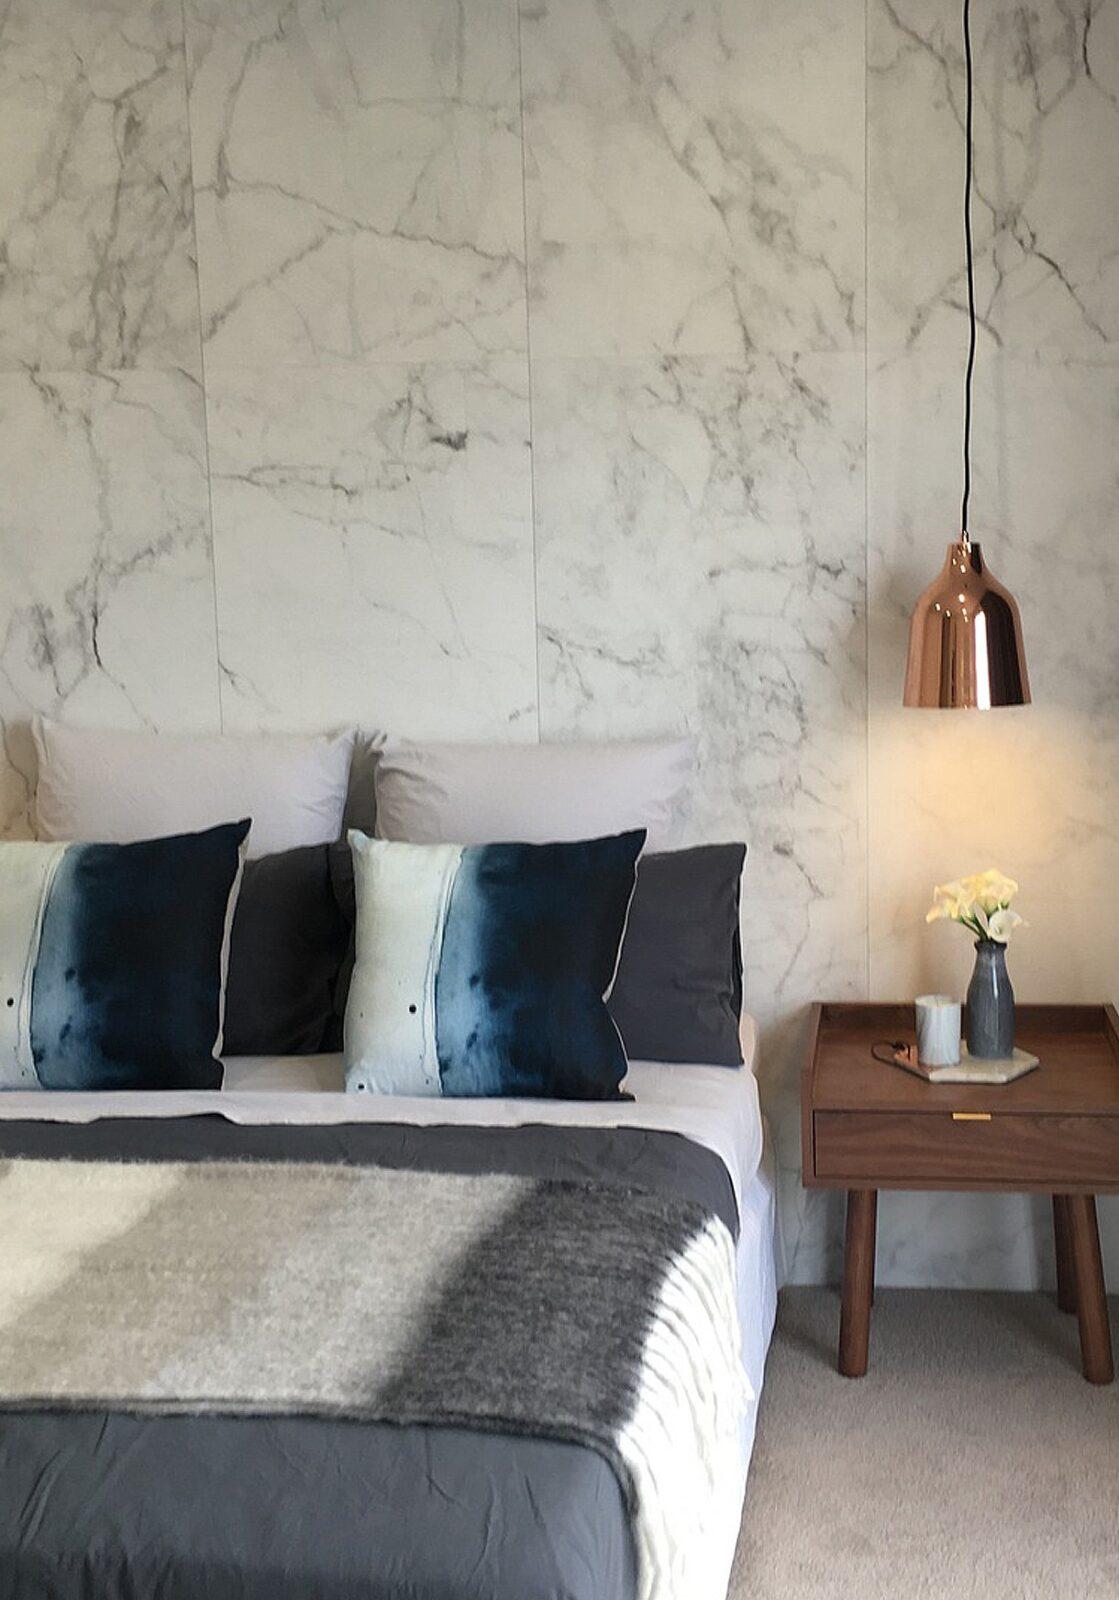 Marble Wallpaper - Tile effect